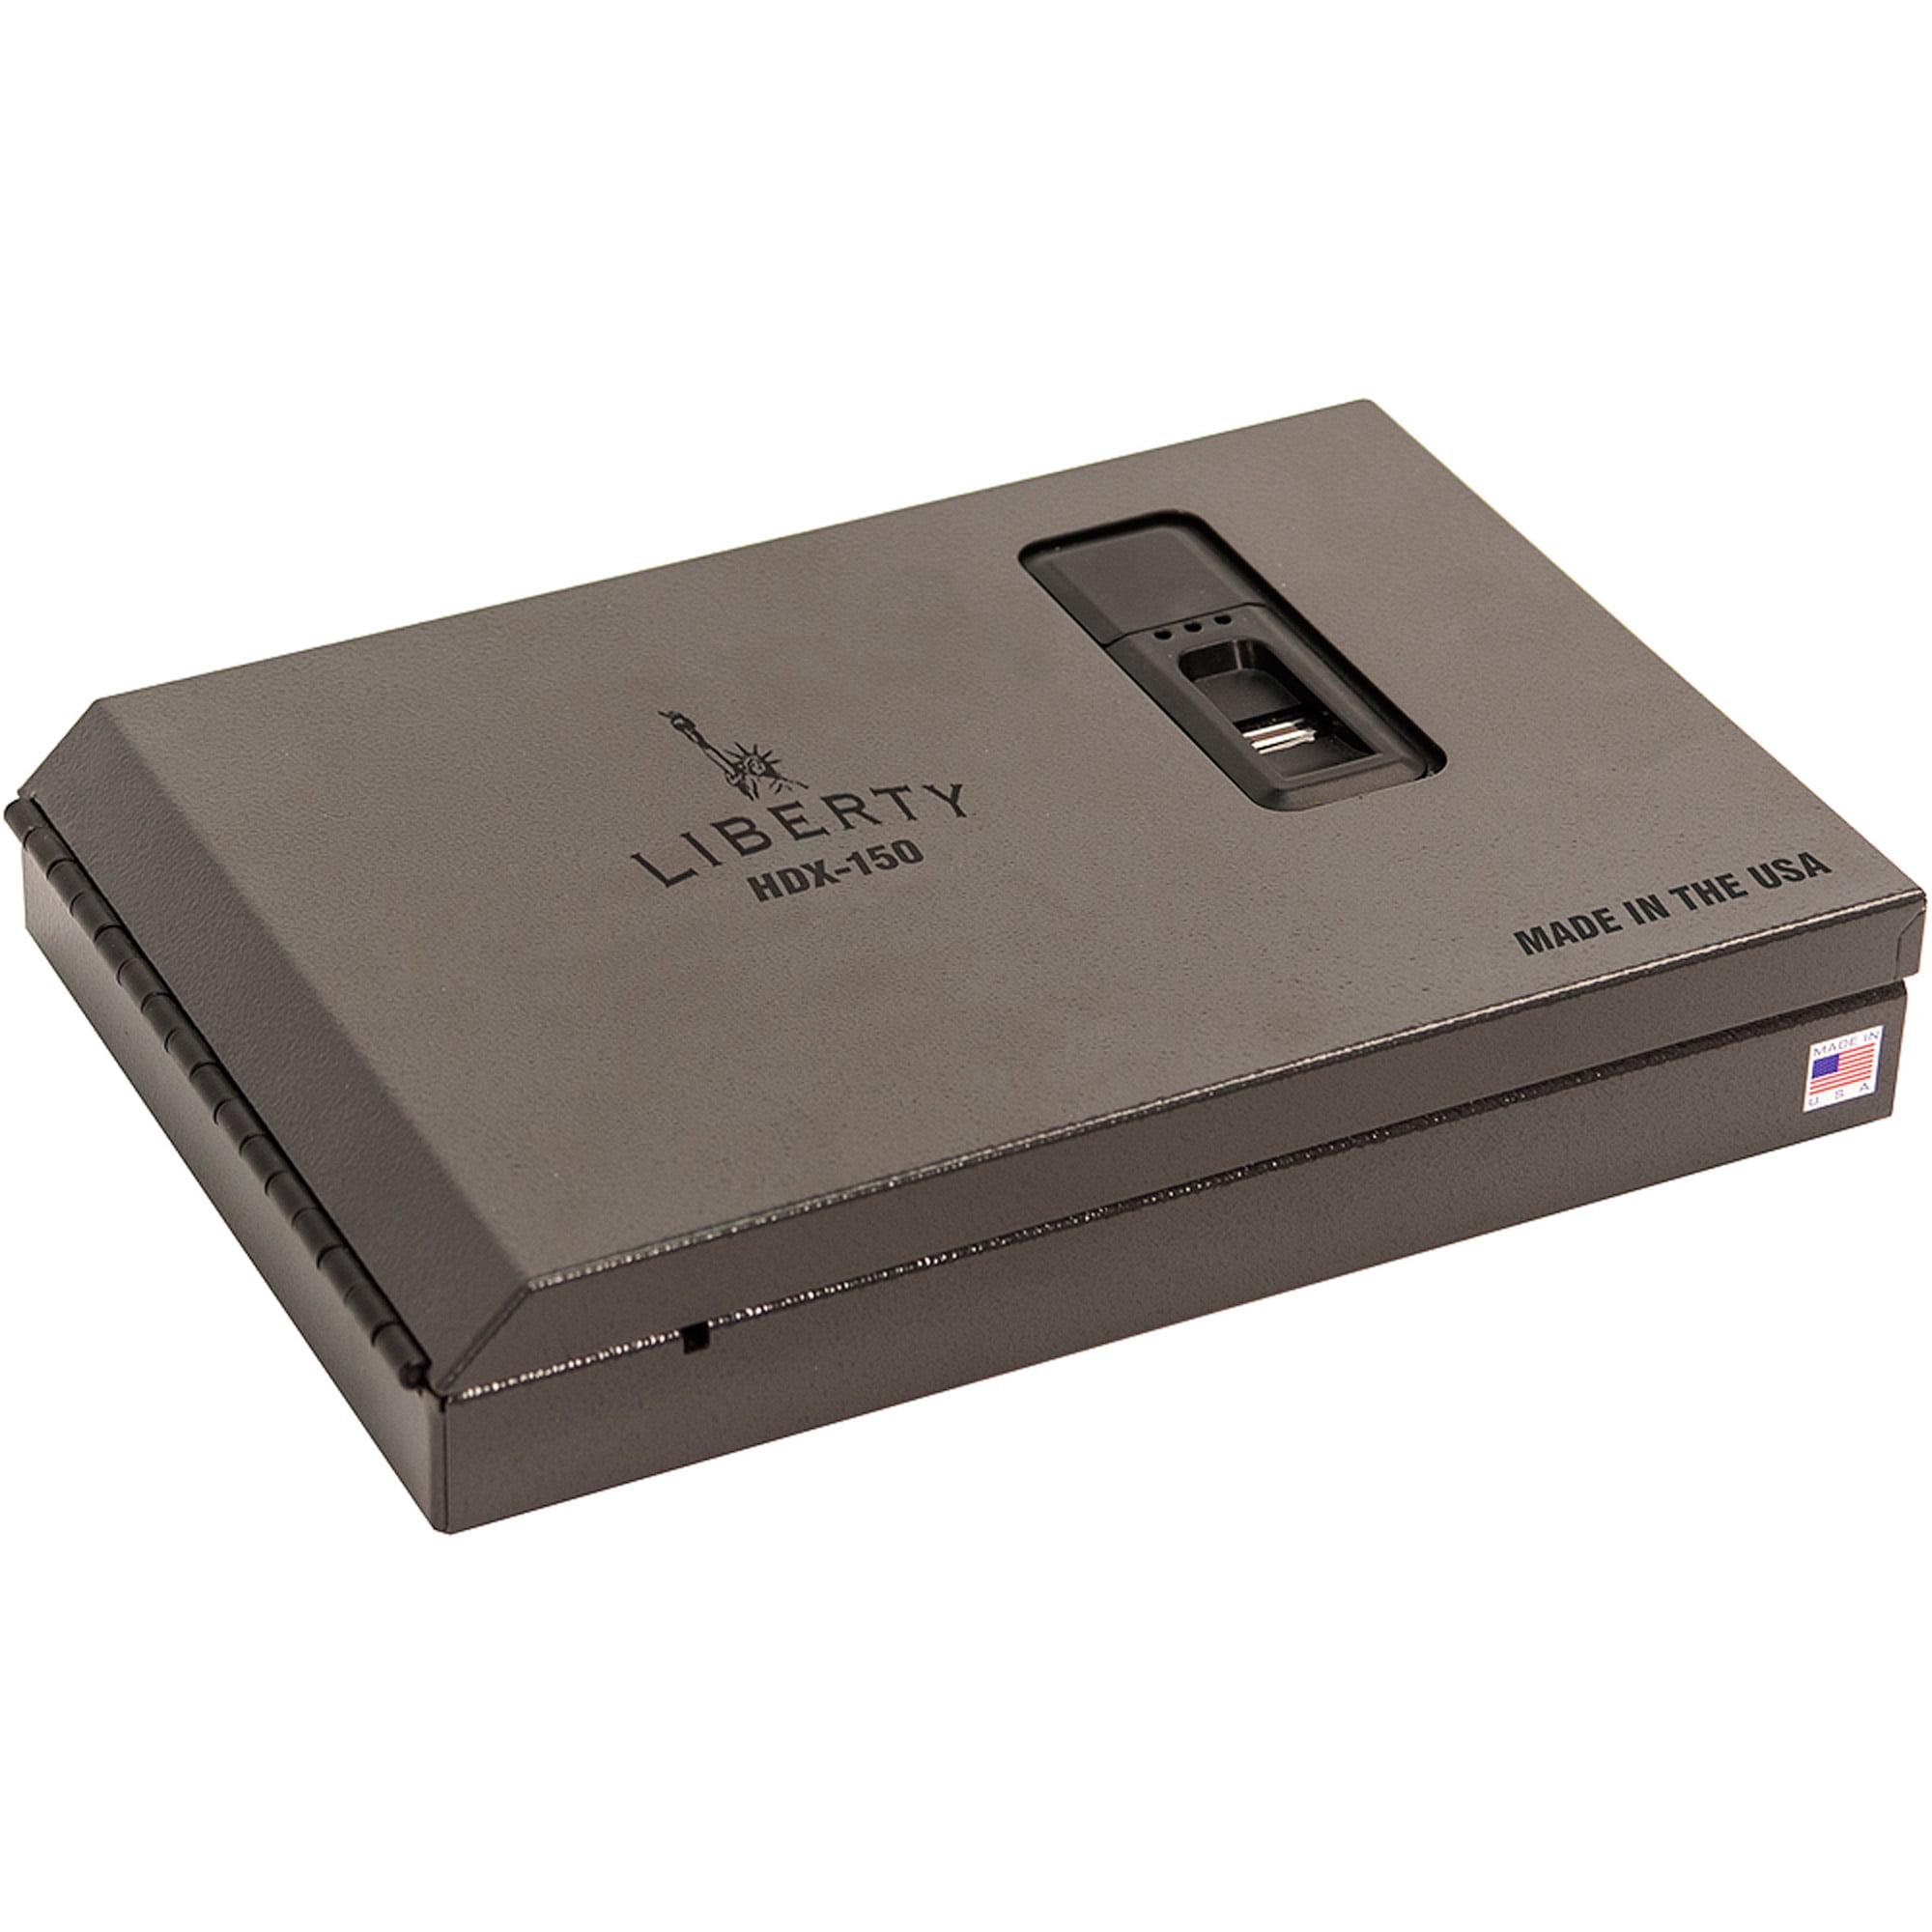 Liberty HDX-150 Smart Vault